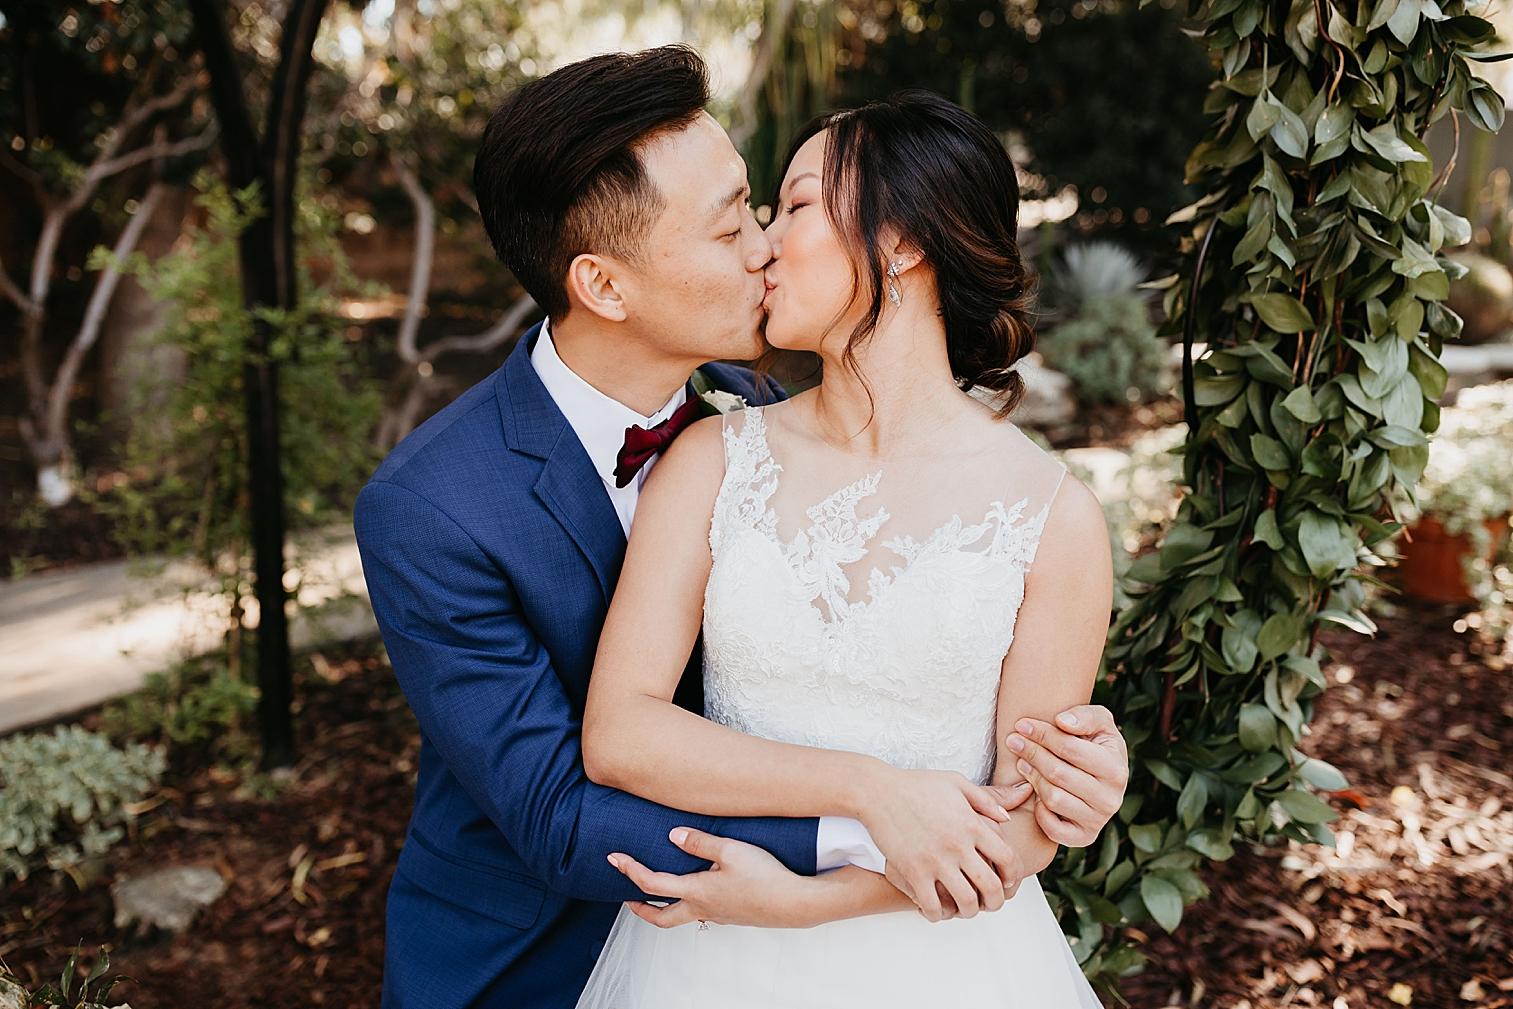 Secret-Garden-Rancho-Santa-Fe-Wedding-45.jpg